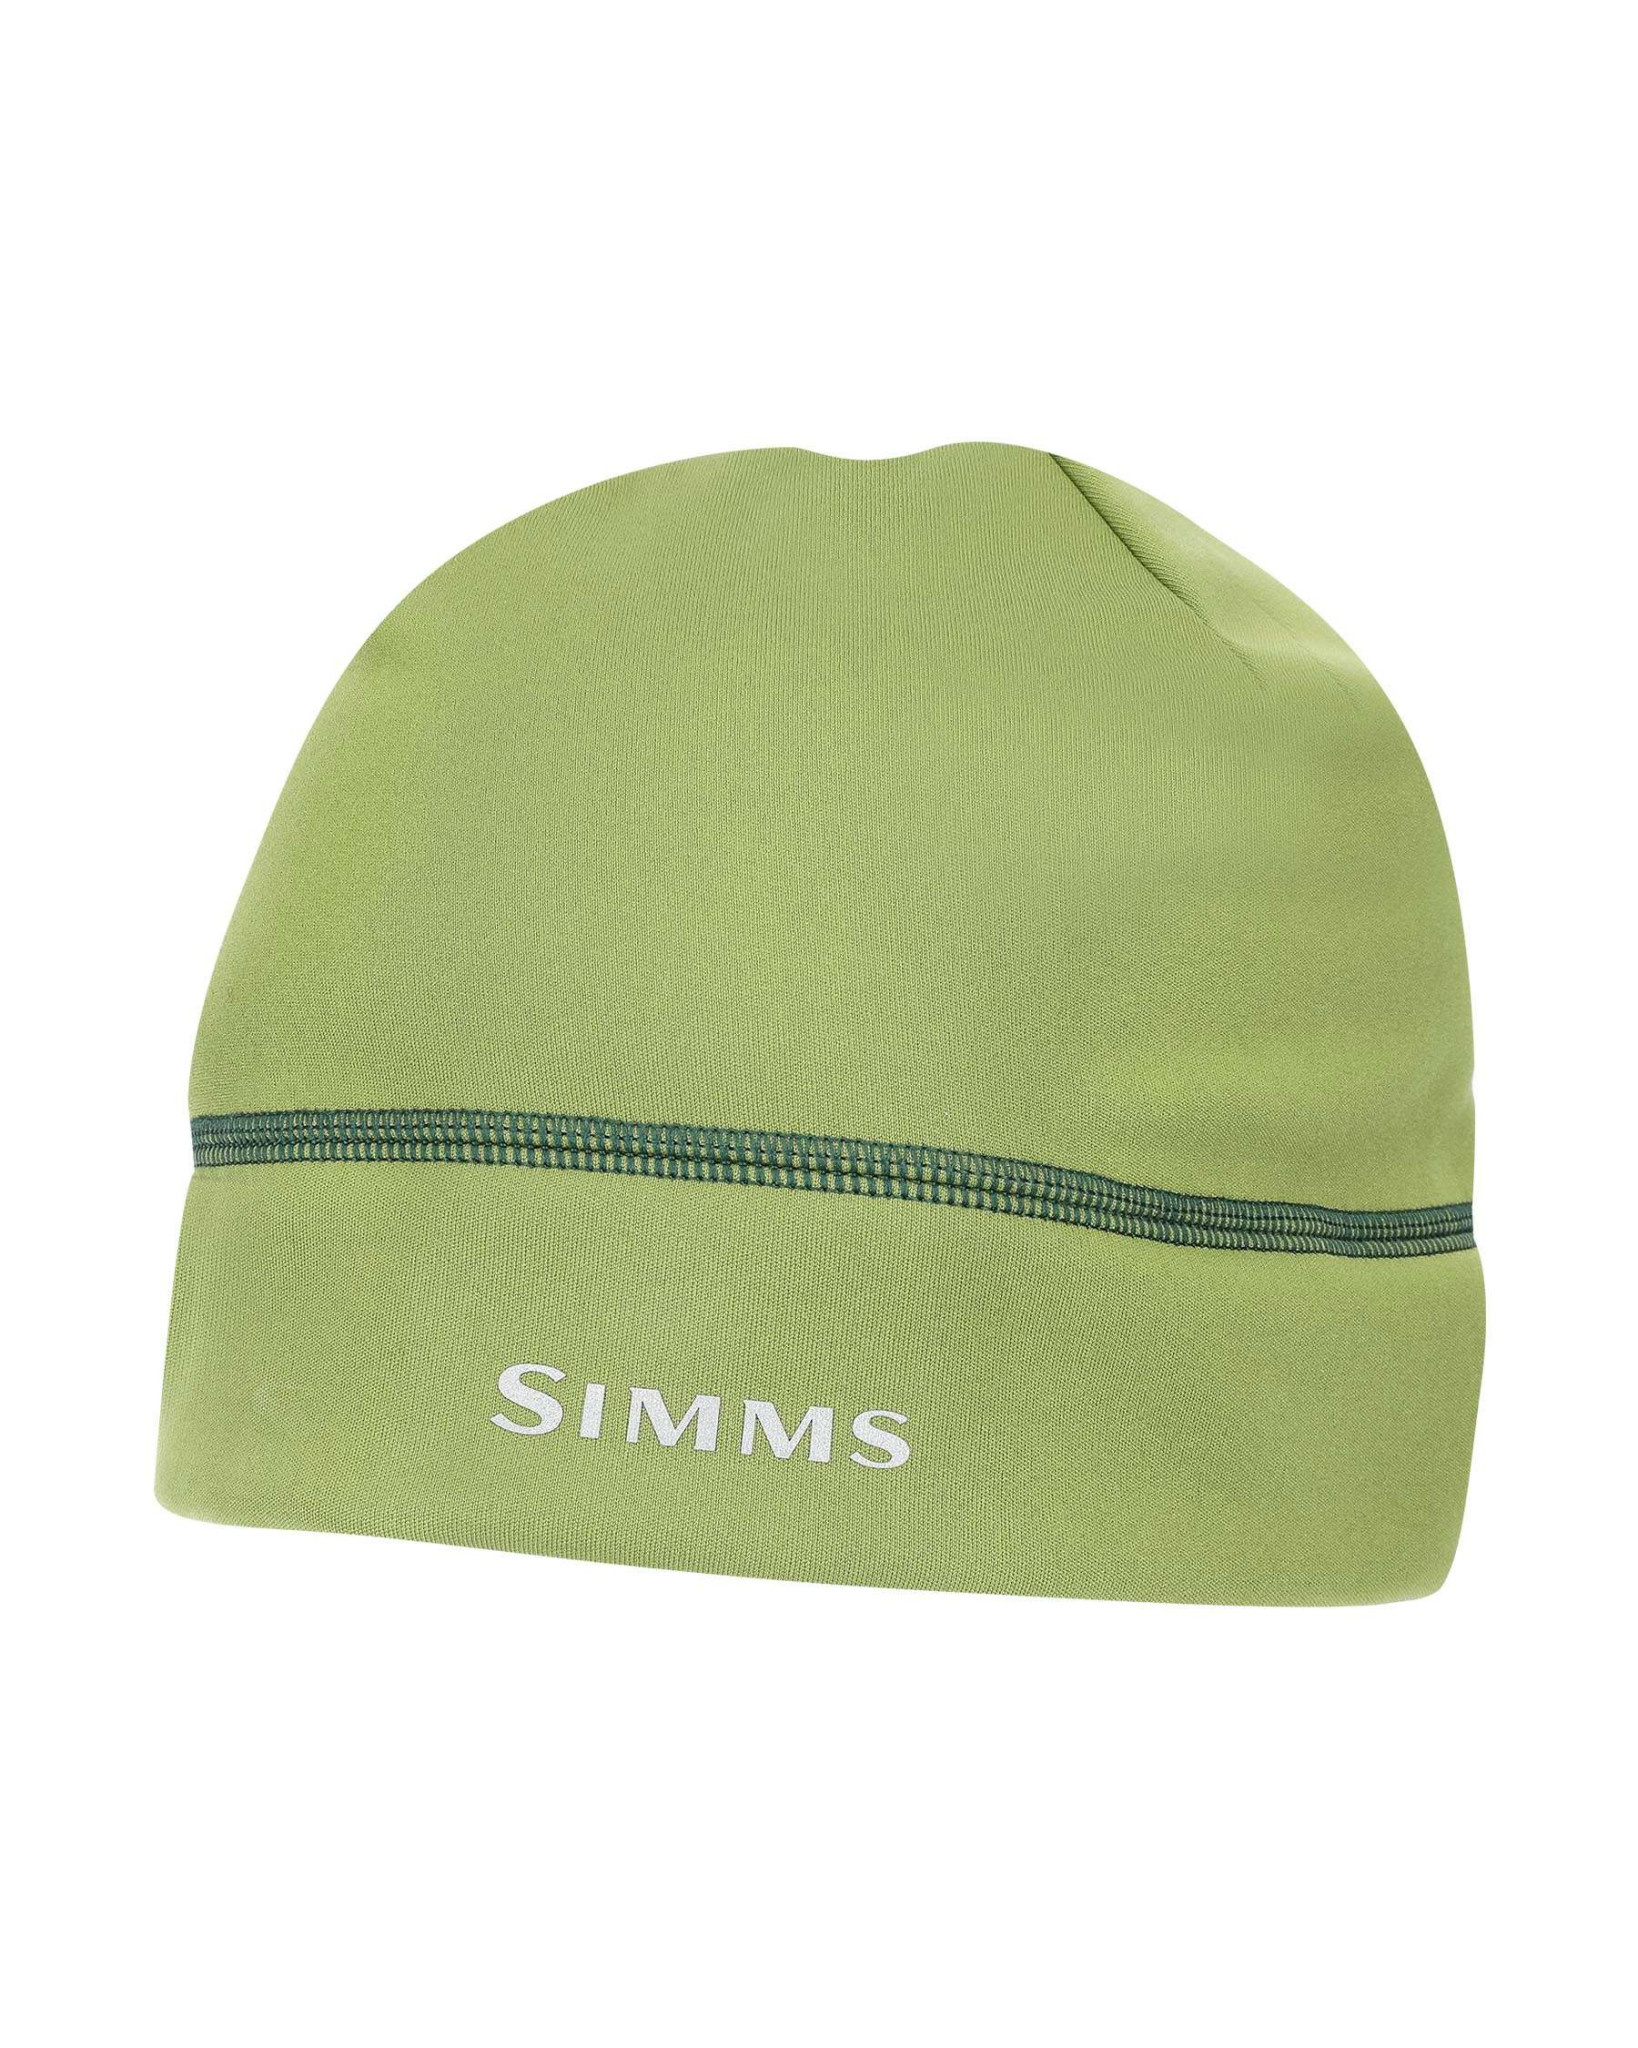 Simms Gore-Tex Infinium Wind Beanie - Cyprus